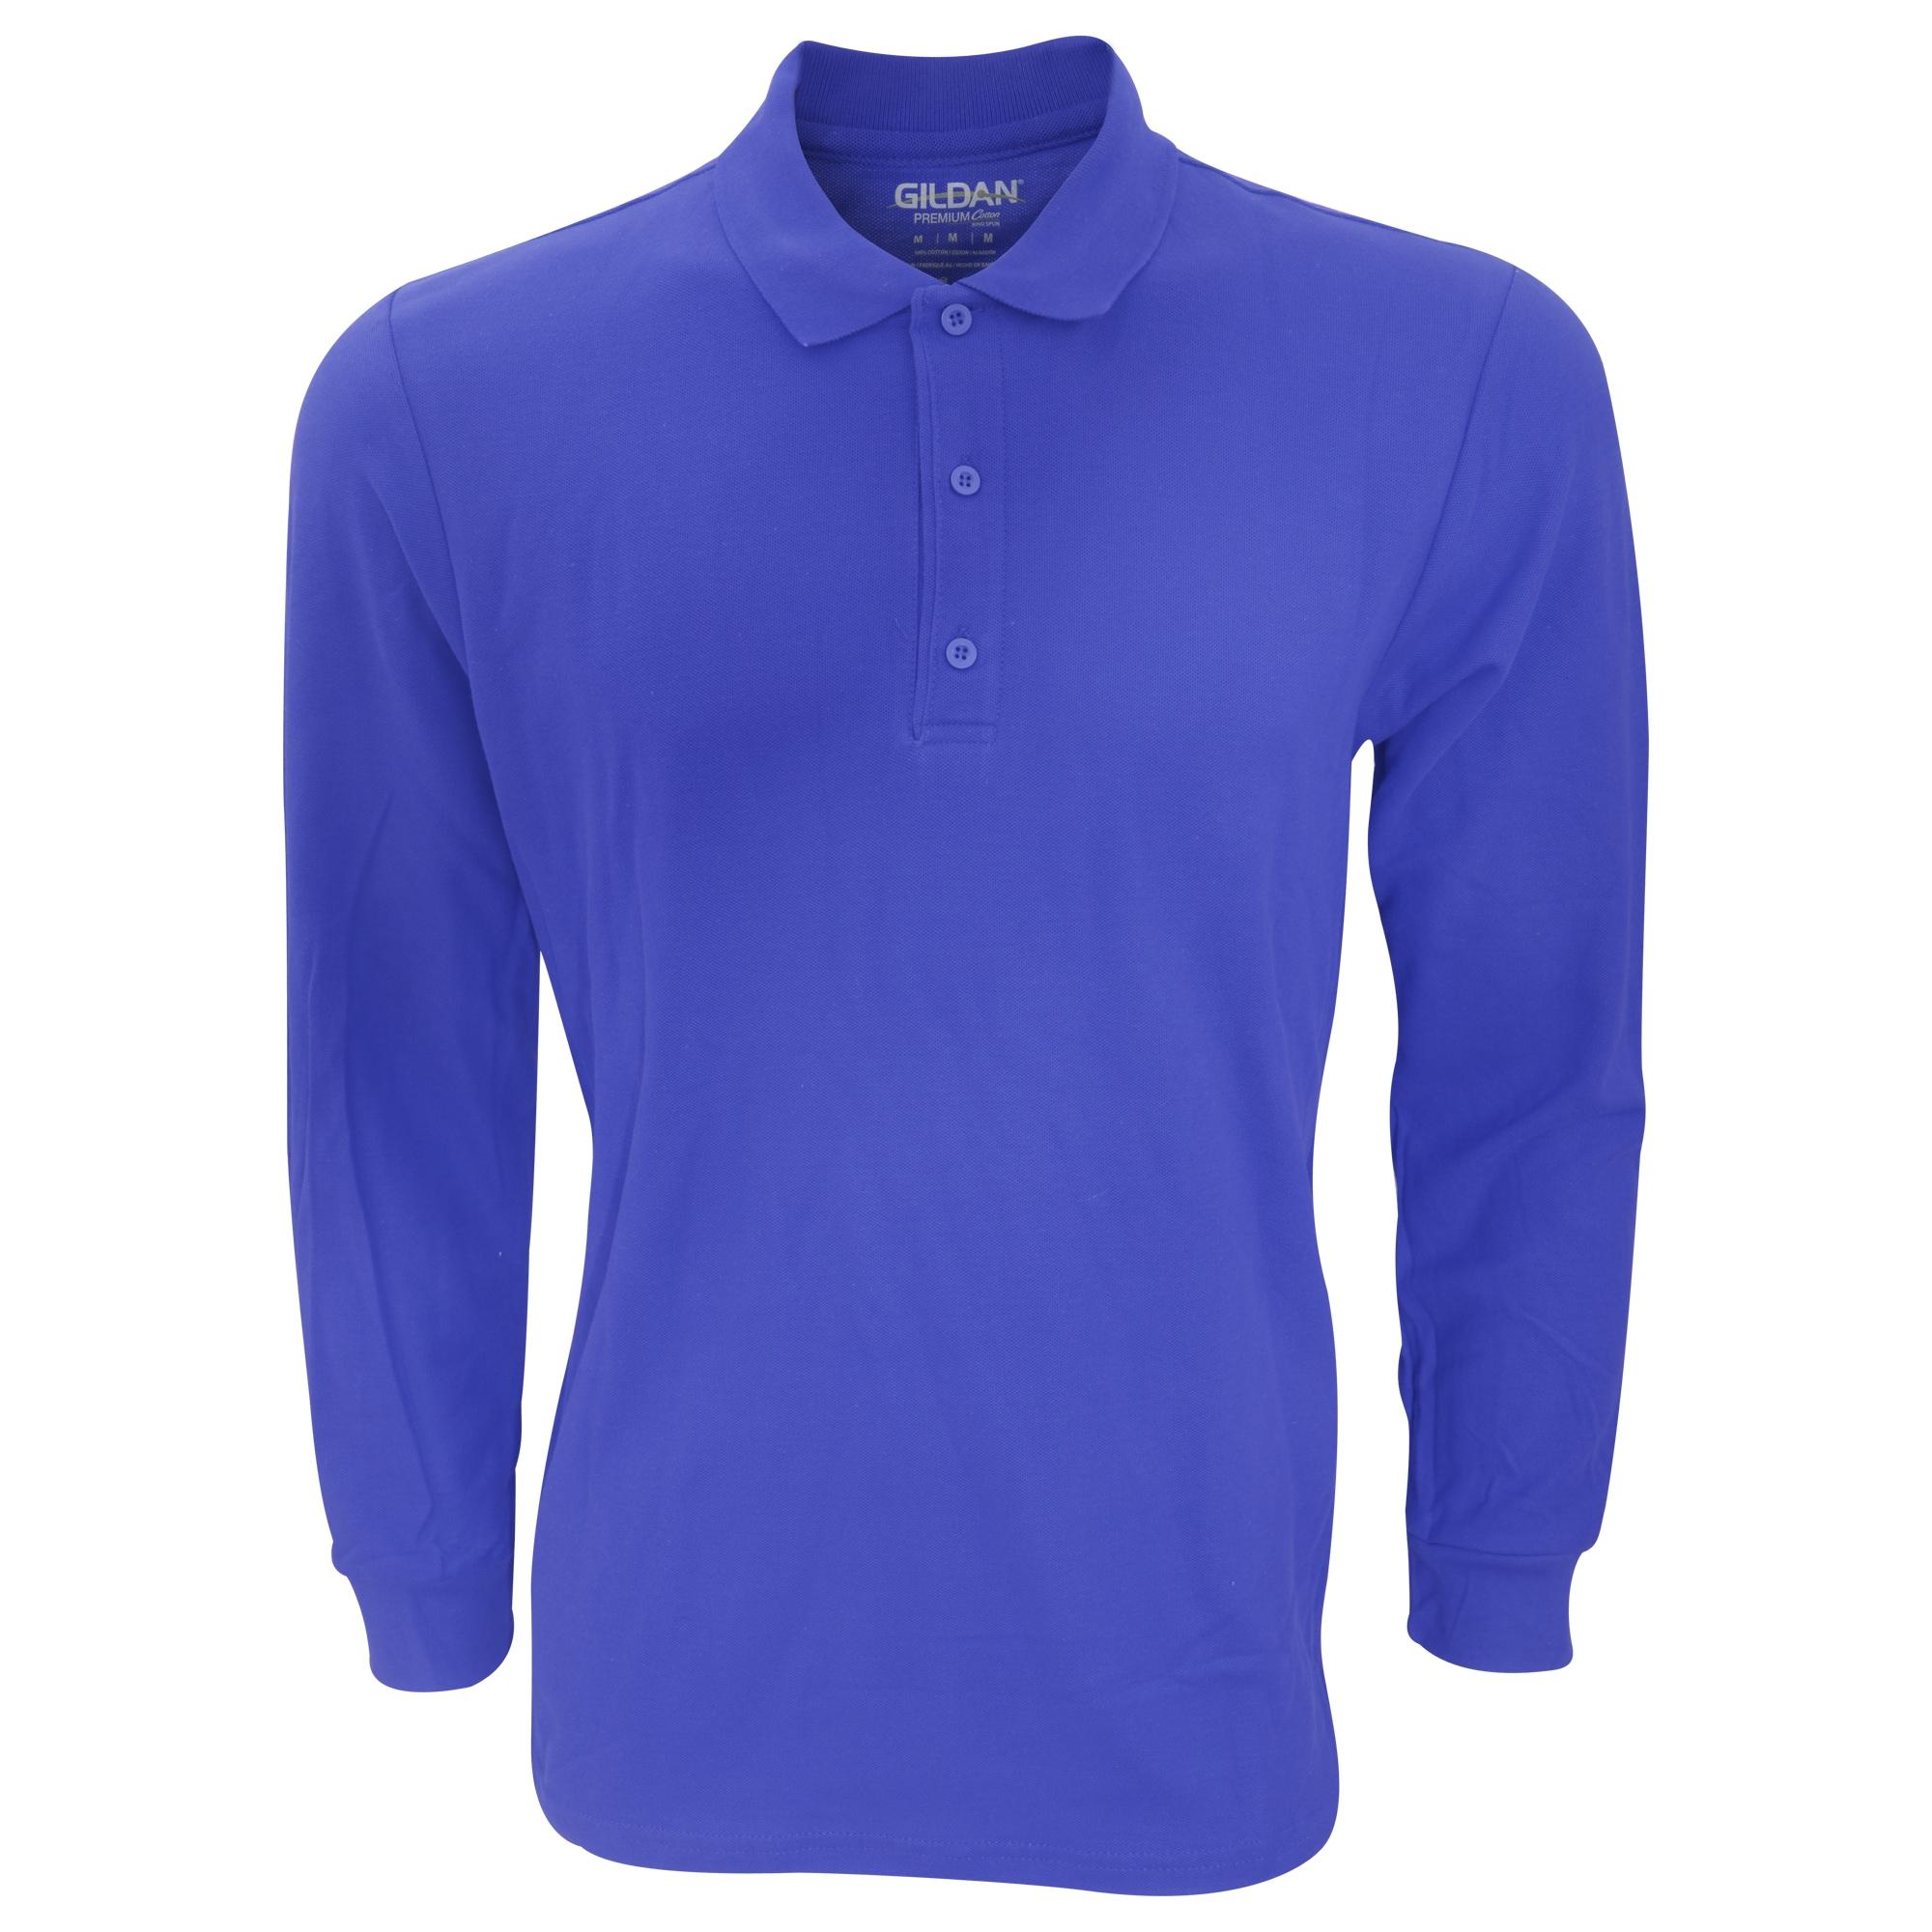 gildan -  Poloshirt Herren Premium Pique Polo-Hemd langärmlig